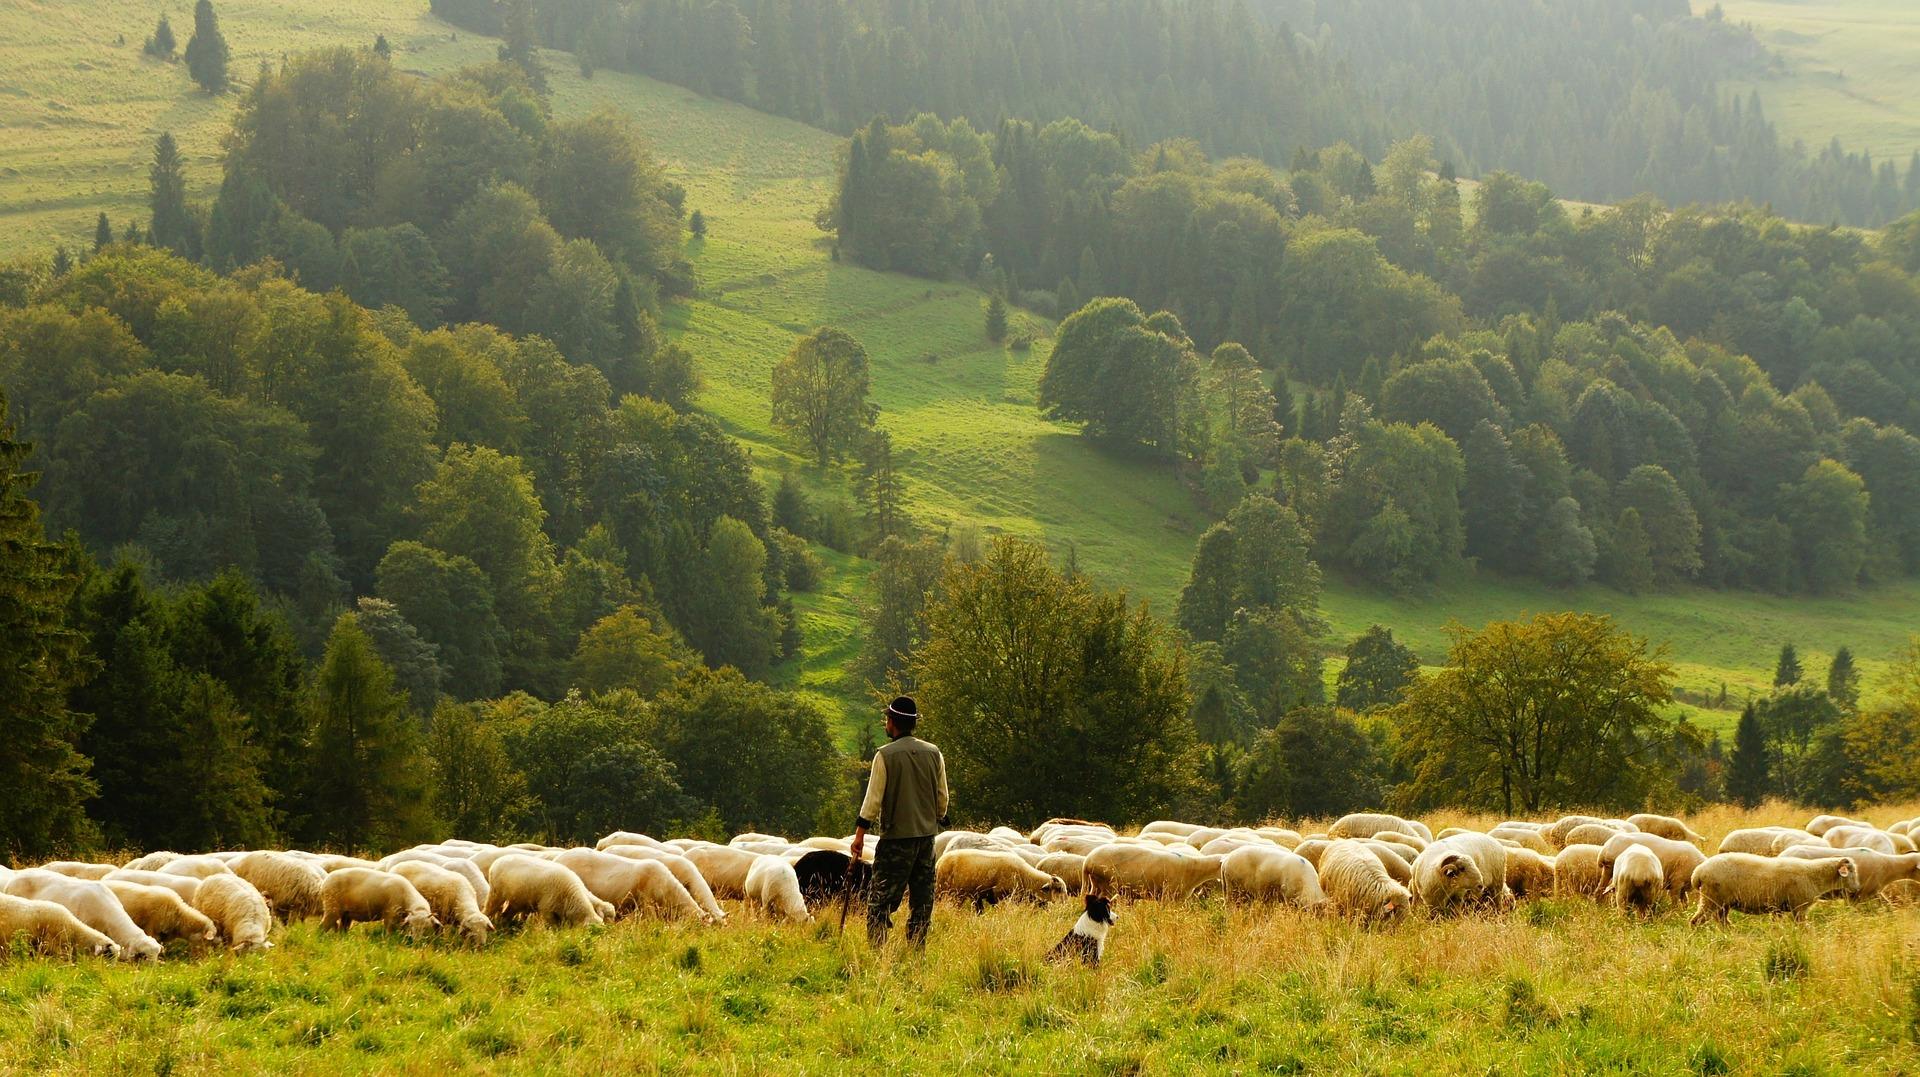 sheep 690198 1920